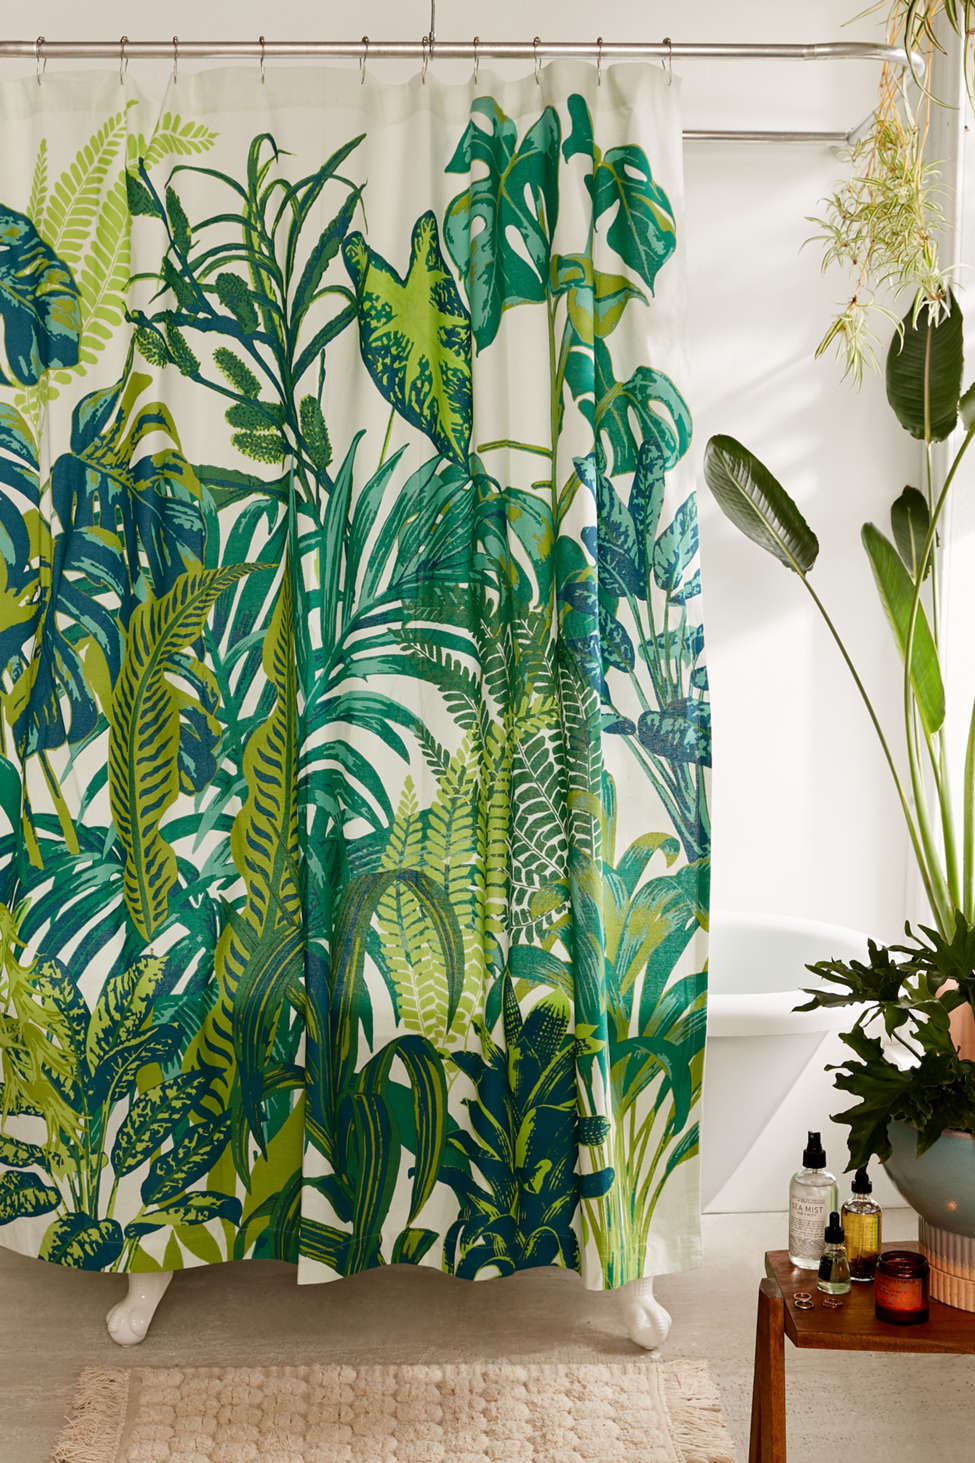 Slide View: 1: Dreamy Jungle Shower Curtain